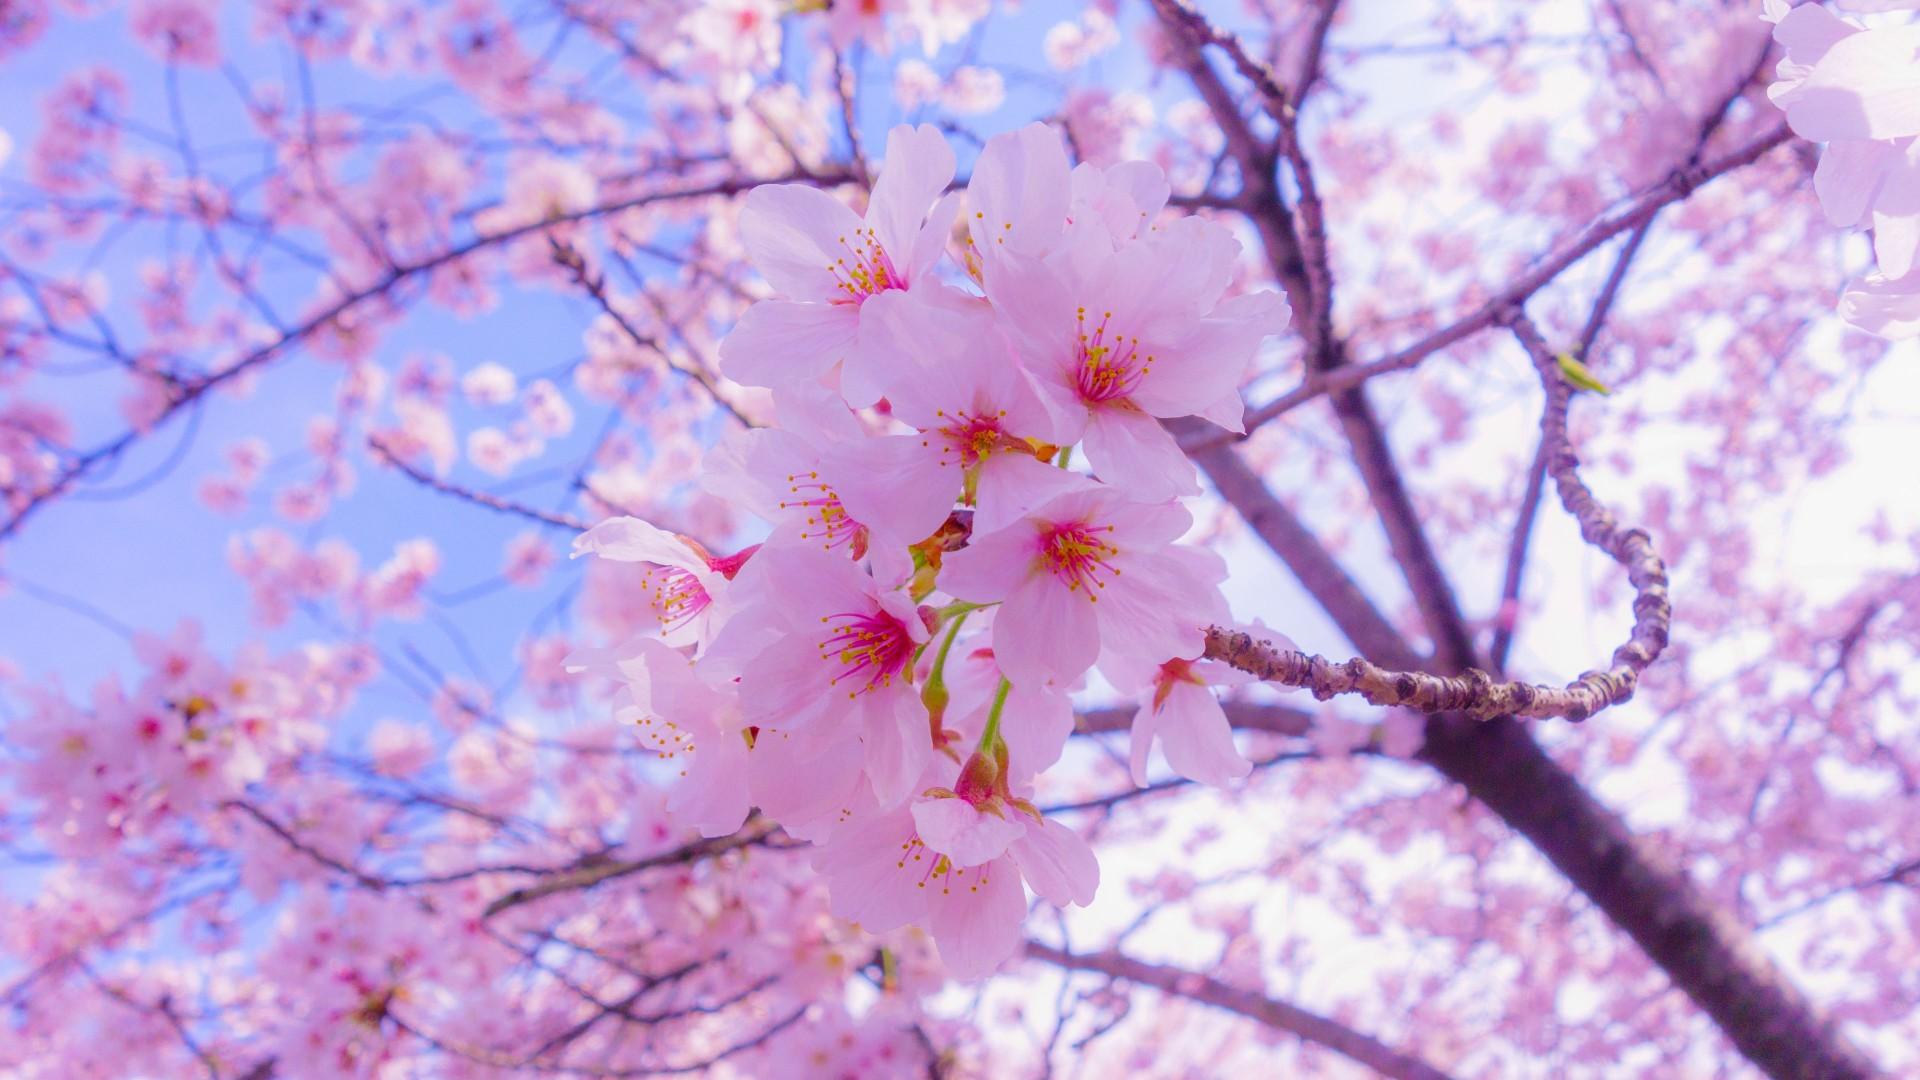 closeup view of pink sakura flowers 4k HD flowers Wallpaper